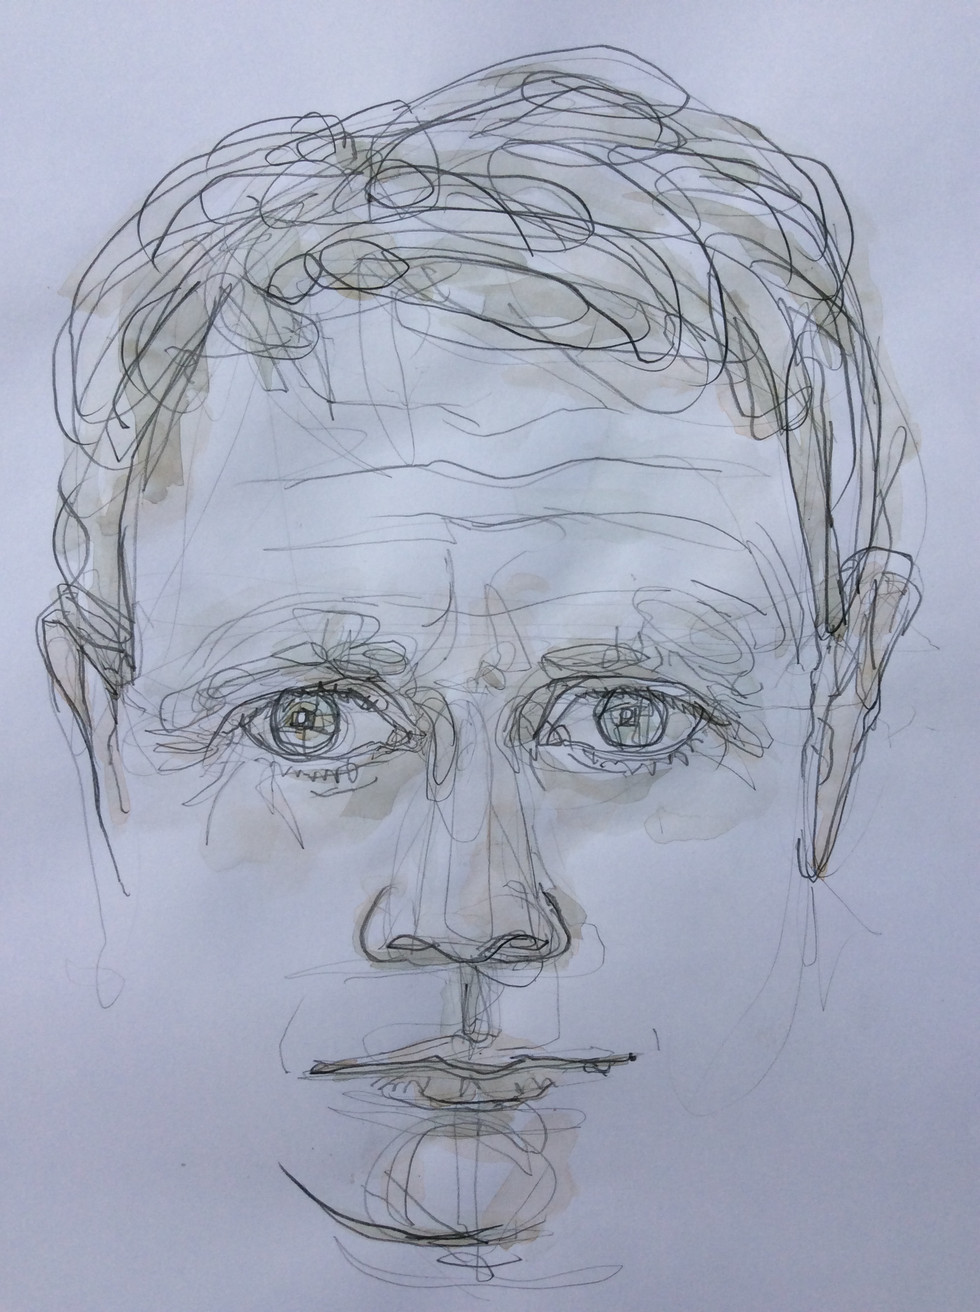 Self Portrait with a Lazy Eye